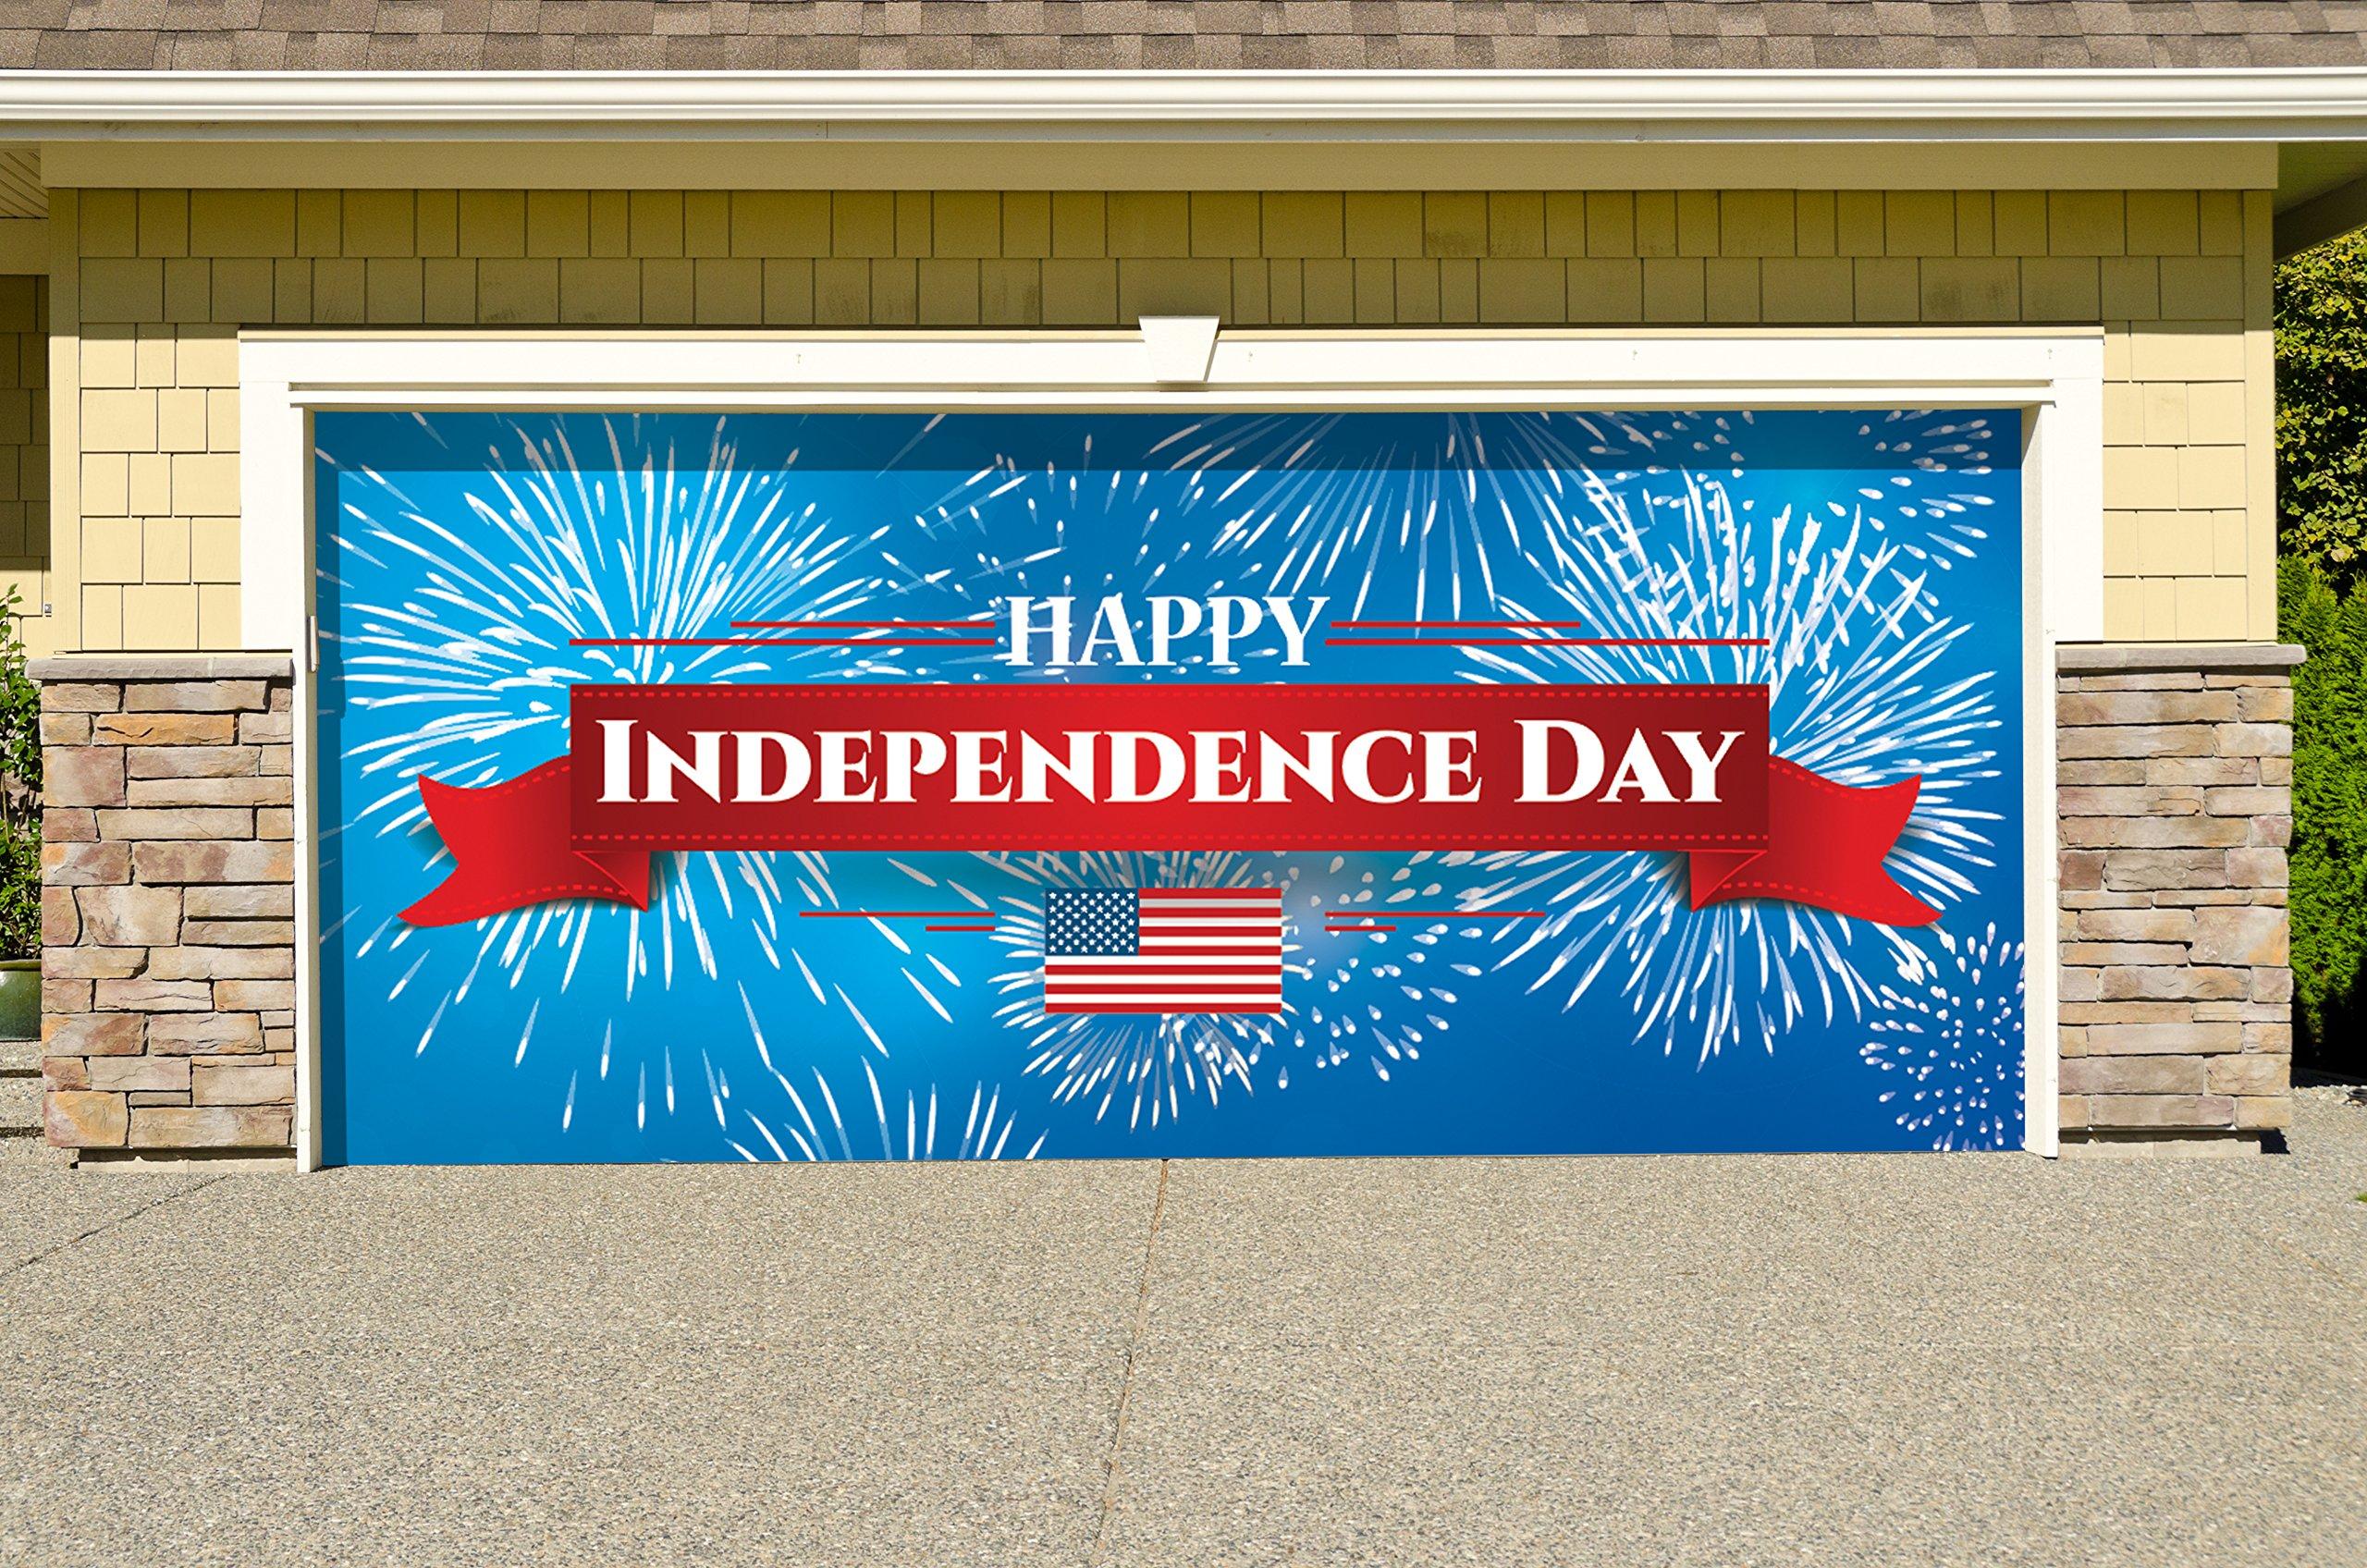 Outdoor Patriotic American Holiday Garage Door Banner Cover Mural Décoration - Fireworks Happy Independence Day - Outdoor American Holiday Garage Door Banner Décor Sign 7'x 16'